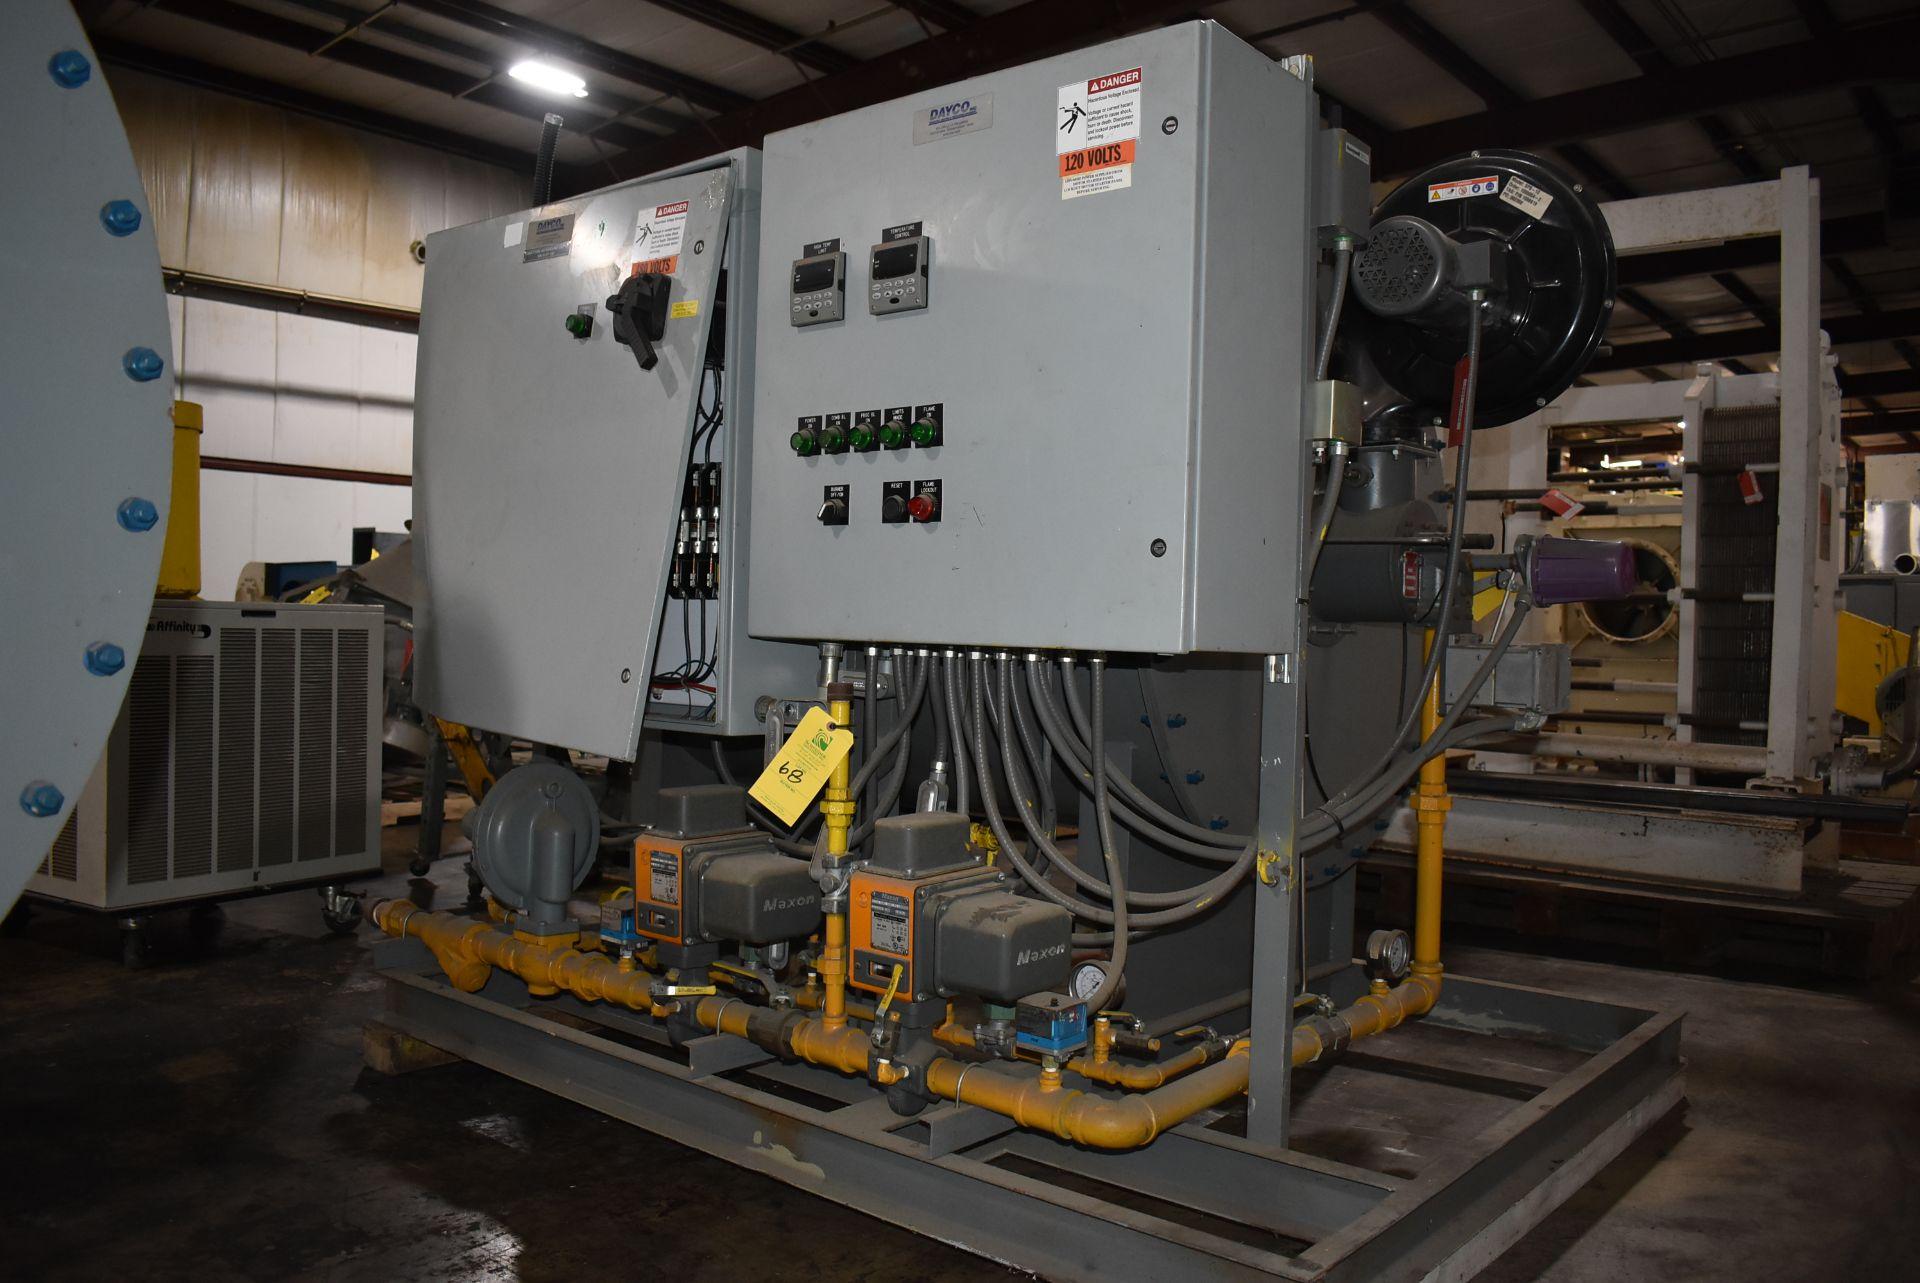 Dayco Model #DFG2200 Direct Fire Handling Unit, SN 119609-B - Image 5 of 5